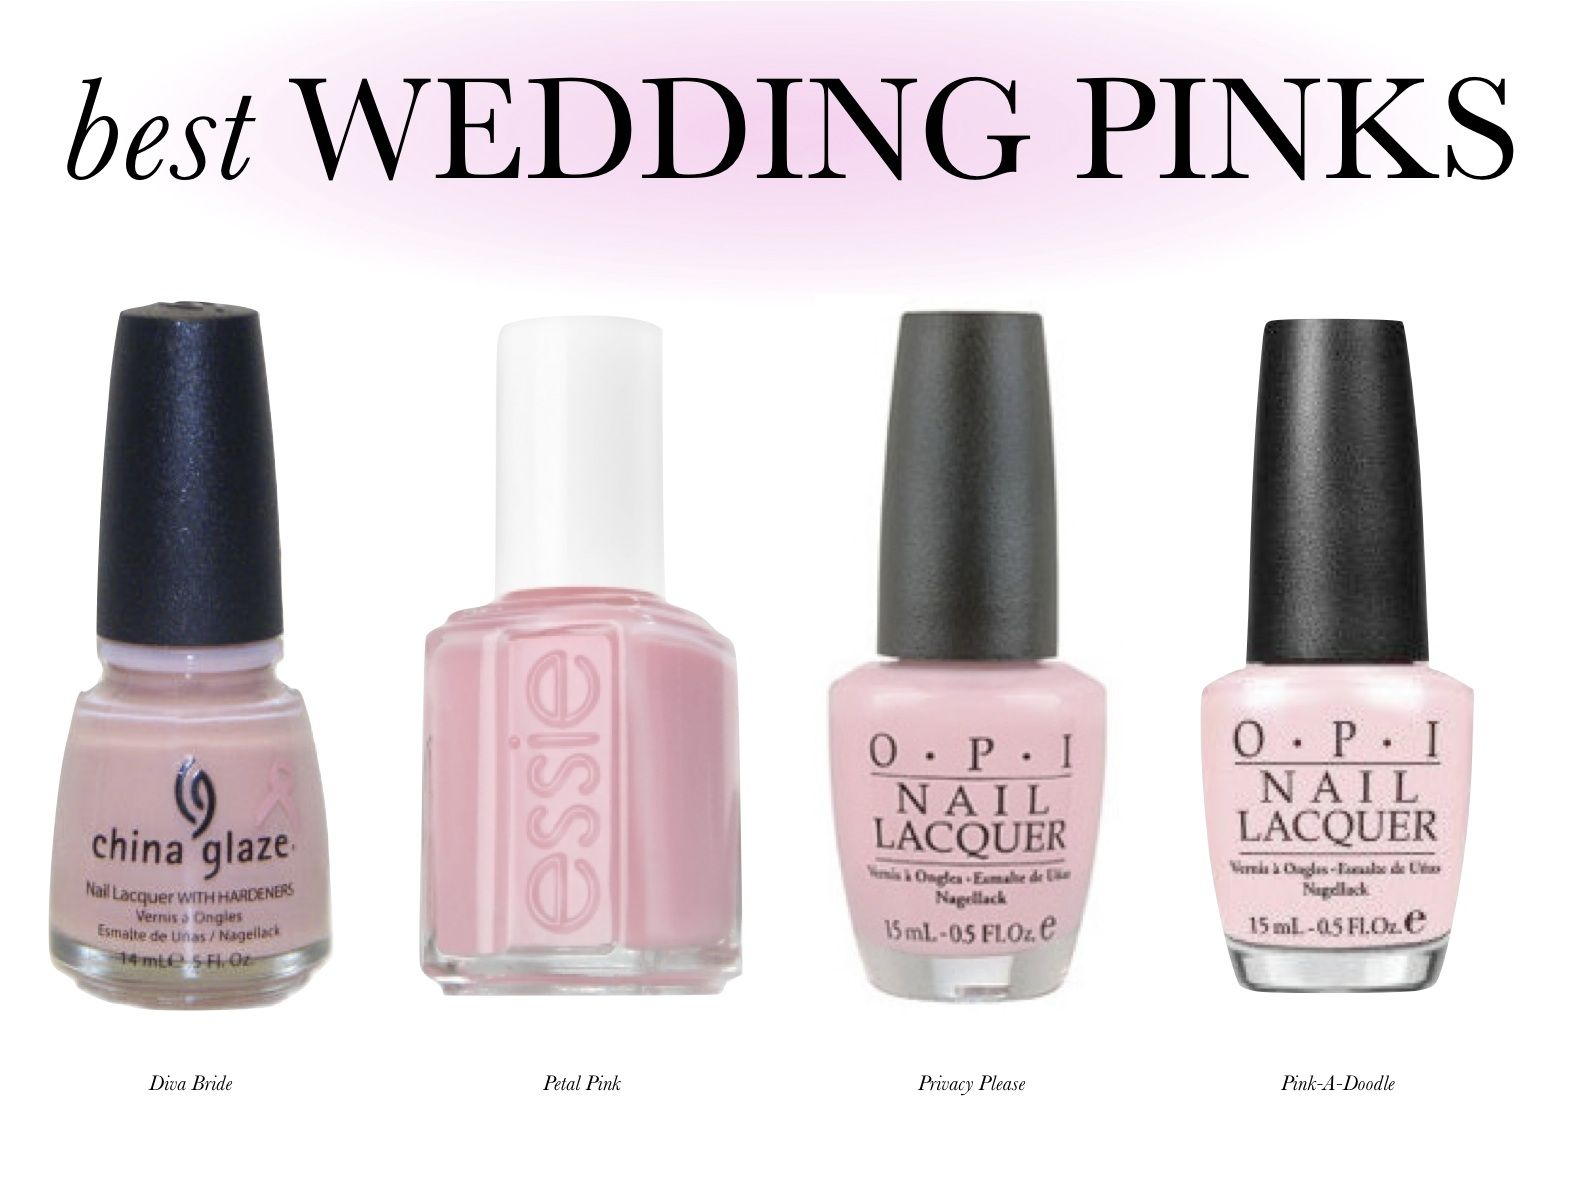 nail polish site full of perfect wedding color nail polish for every seasoncolor